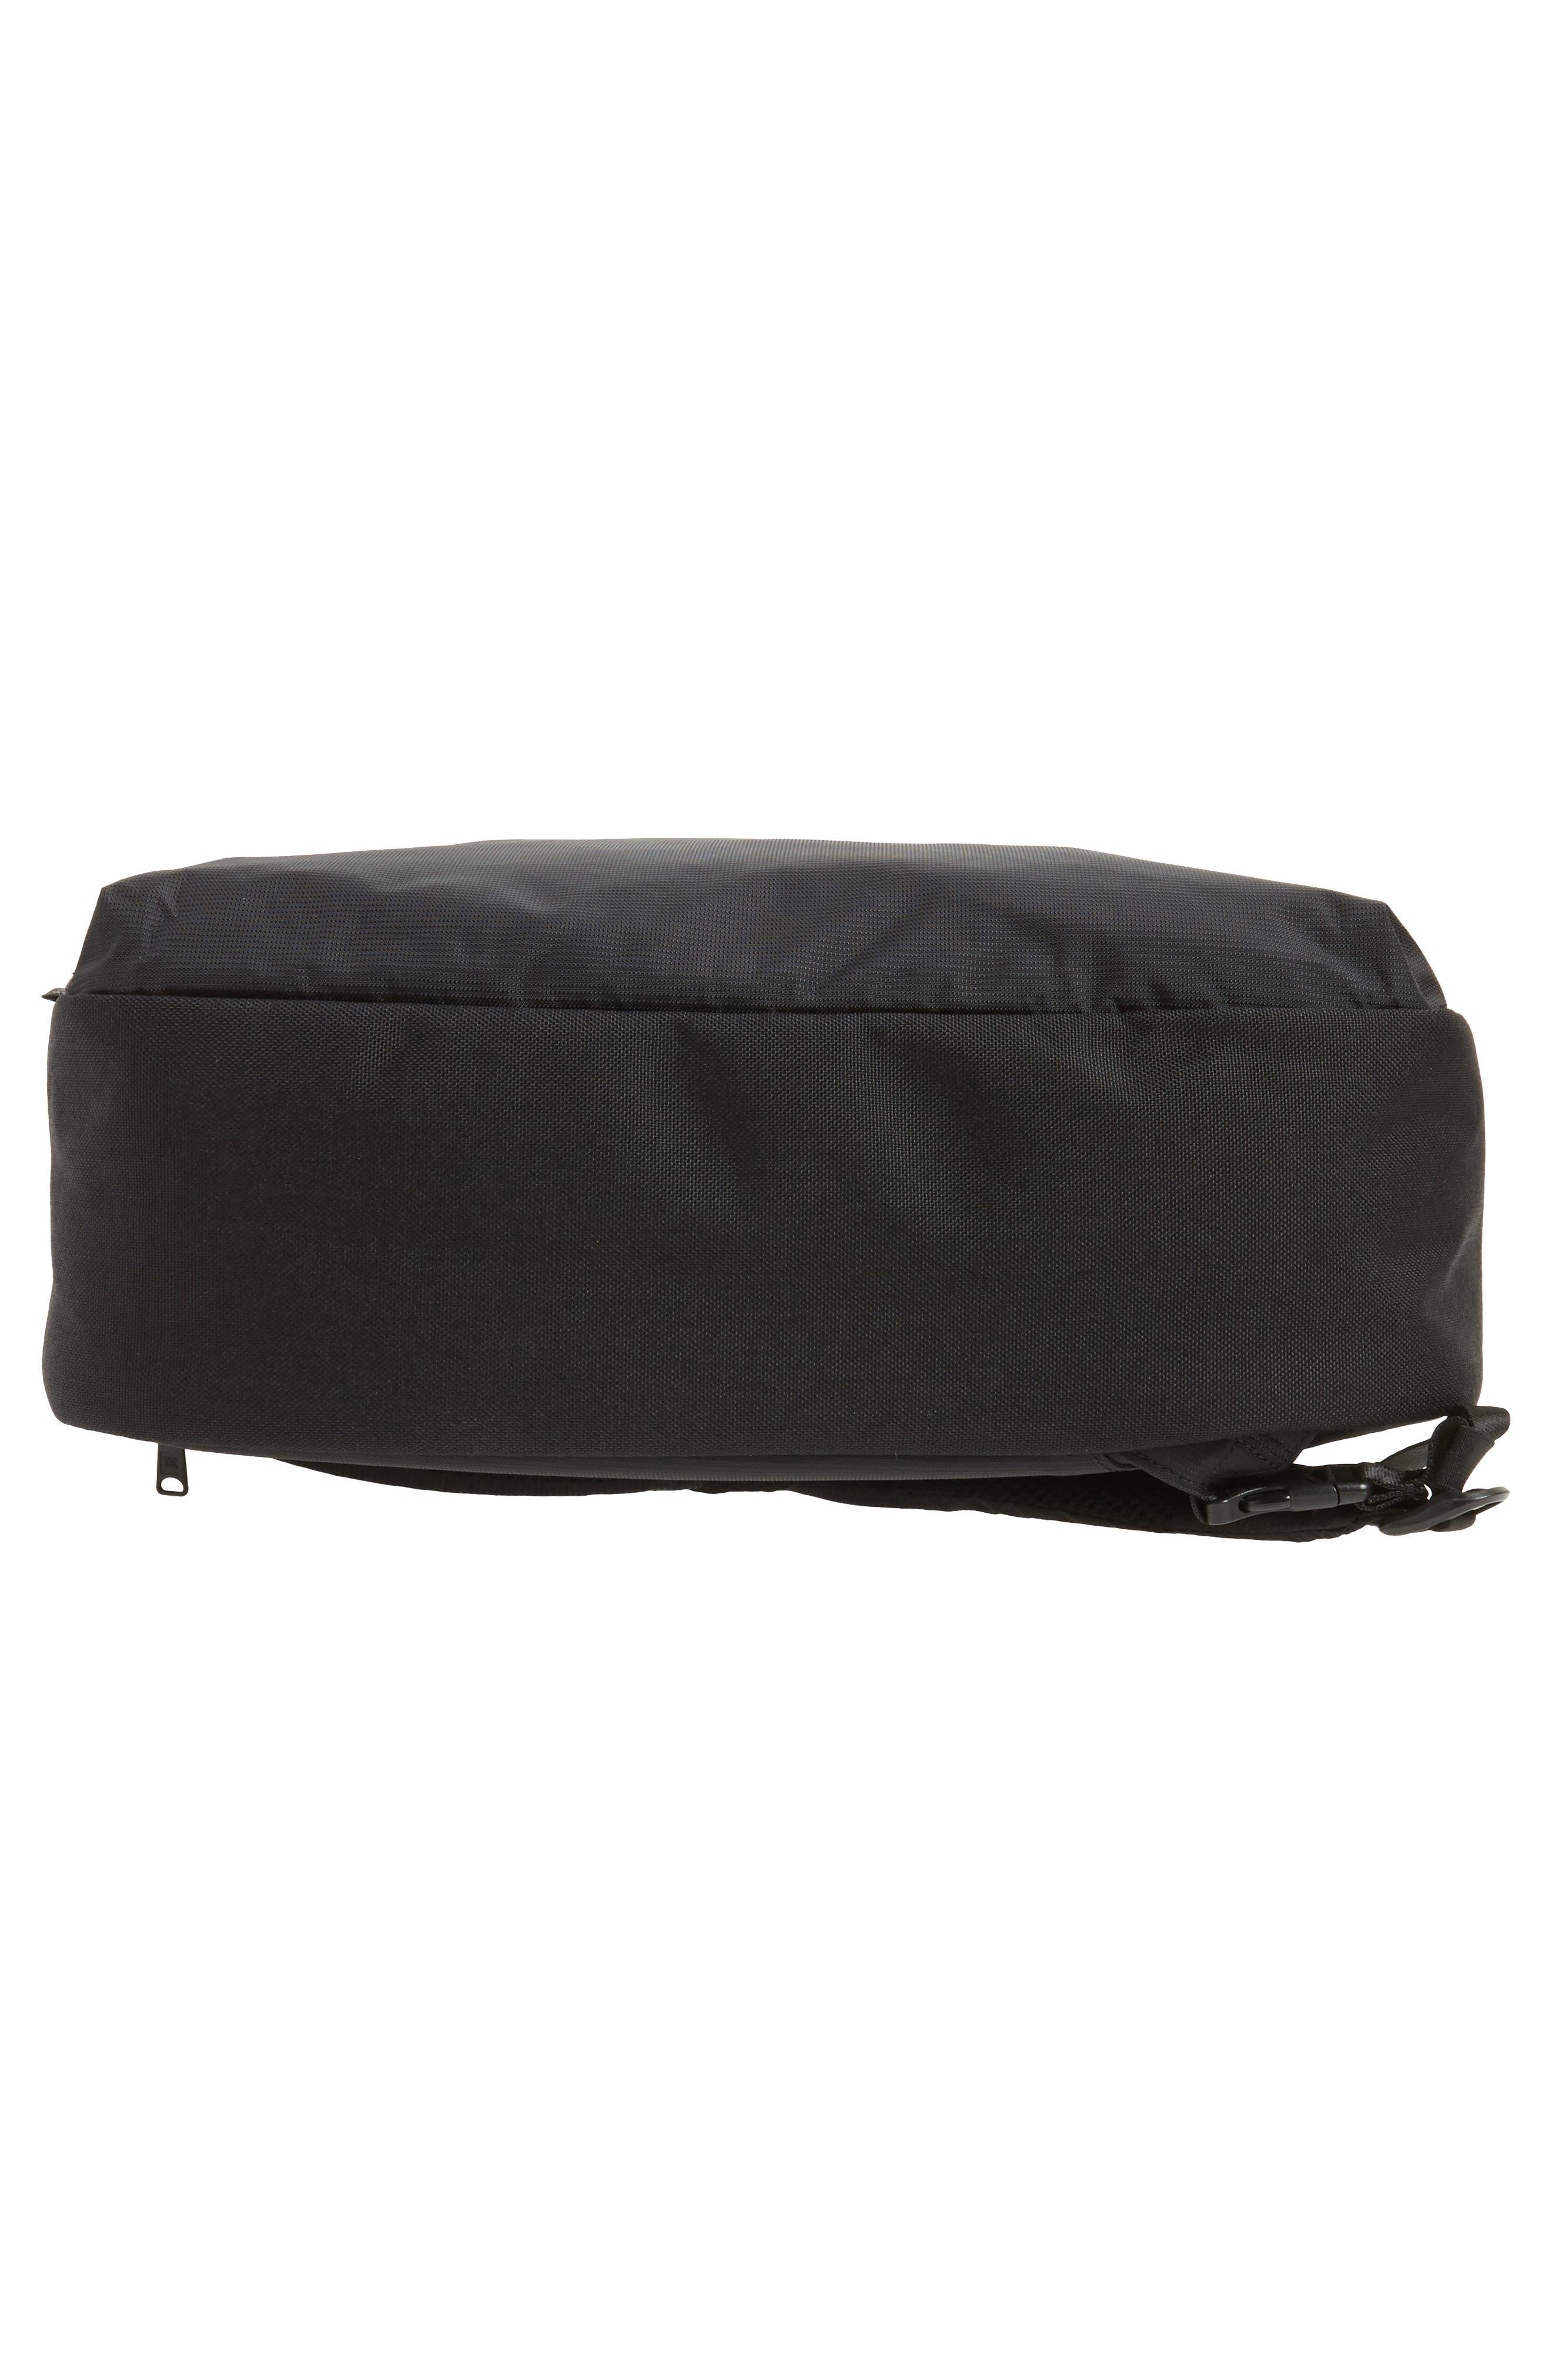 Britannia Convertible Messenger Bag,                             Alternate thumbnail 6, color,                             BLACK